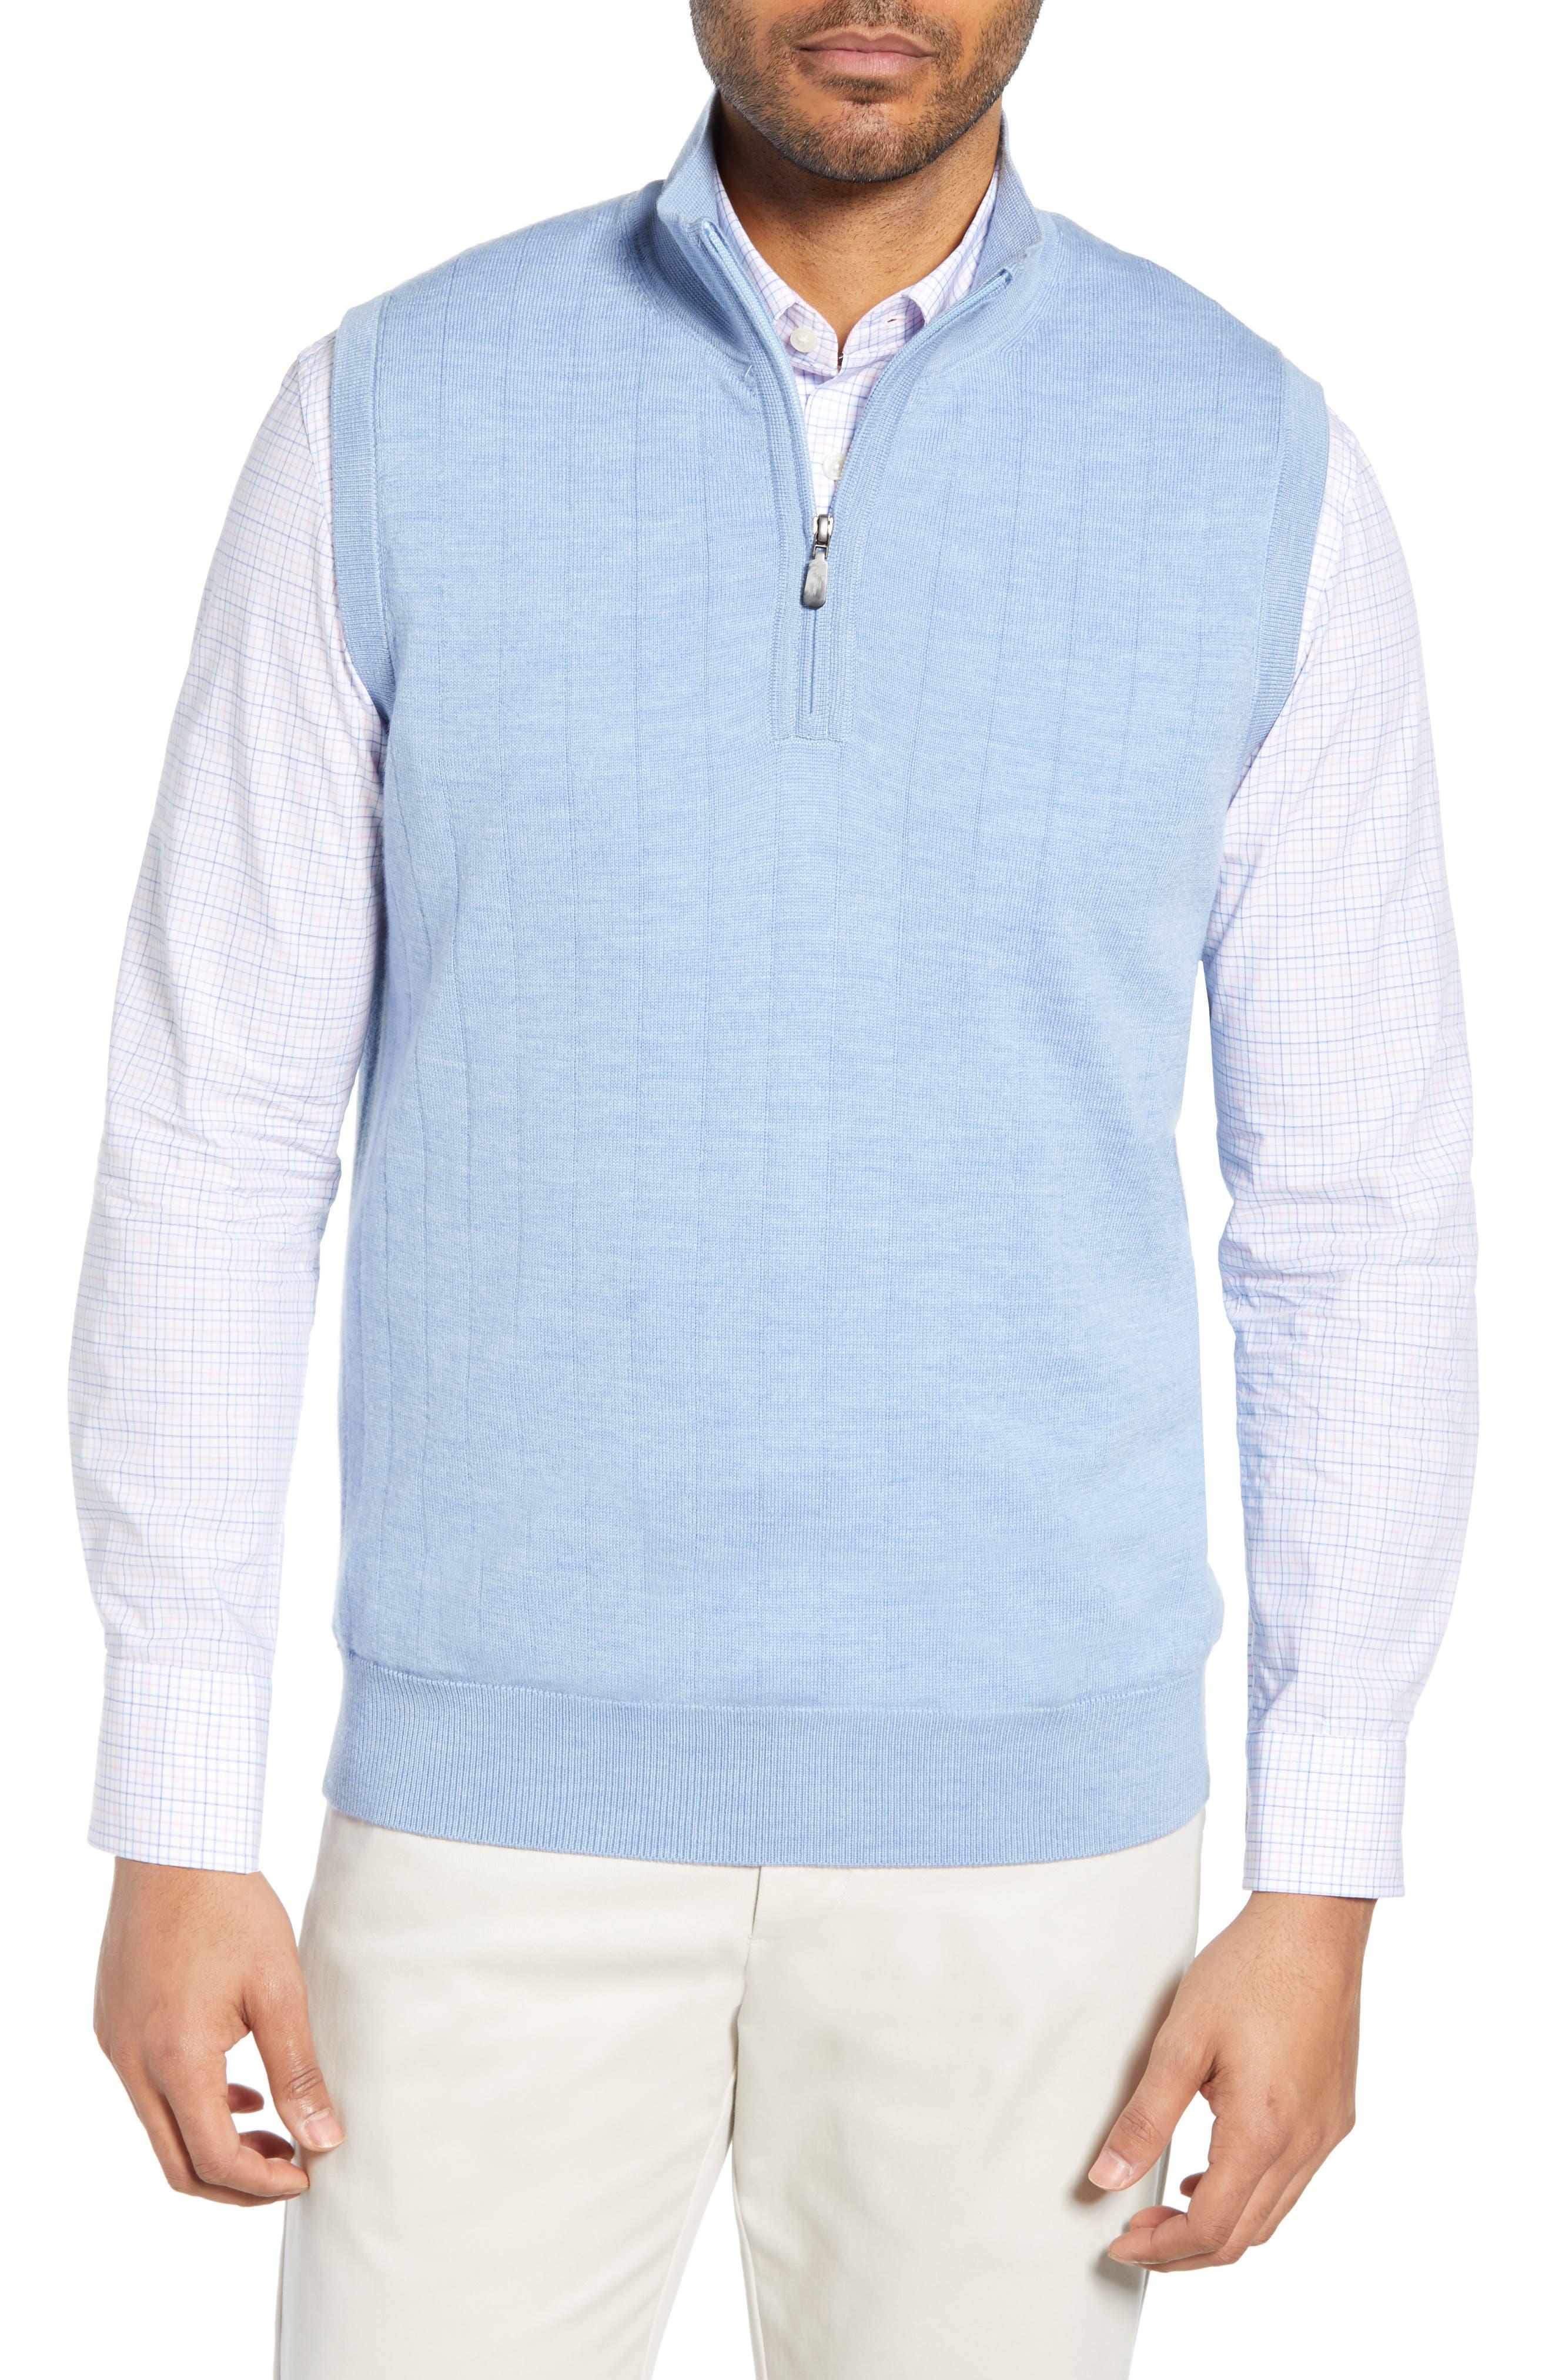 Quarter Zip Wool Sweater Vest, Main, color, LIGHT BLUE